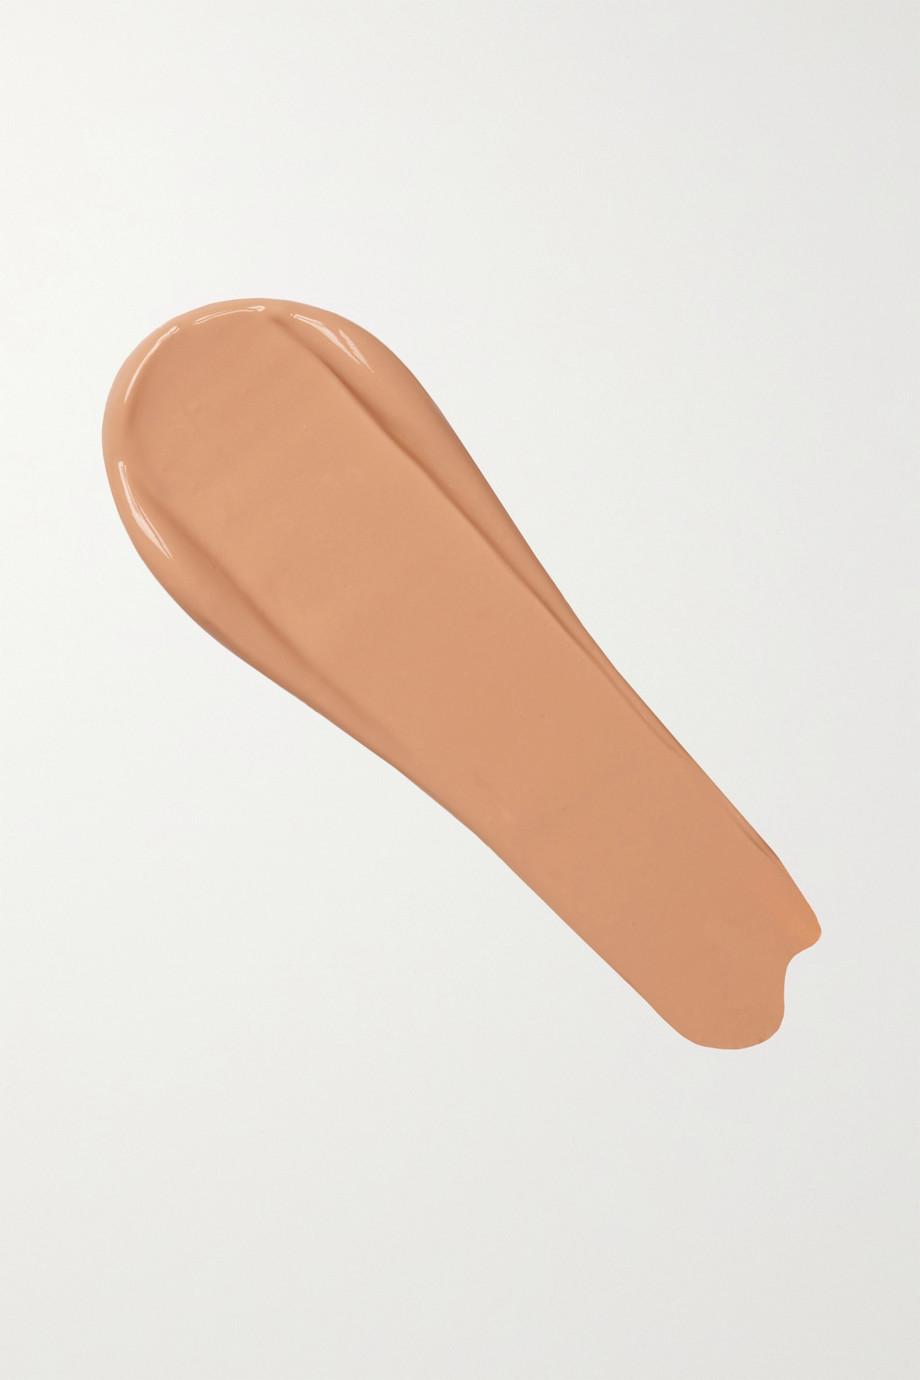 Pat McGrath Labs Skin Fetish: Sublime Perfection Concealer - LM10, 5ml